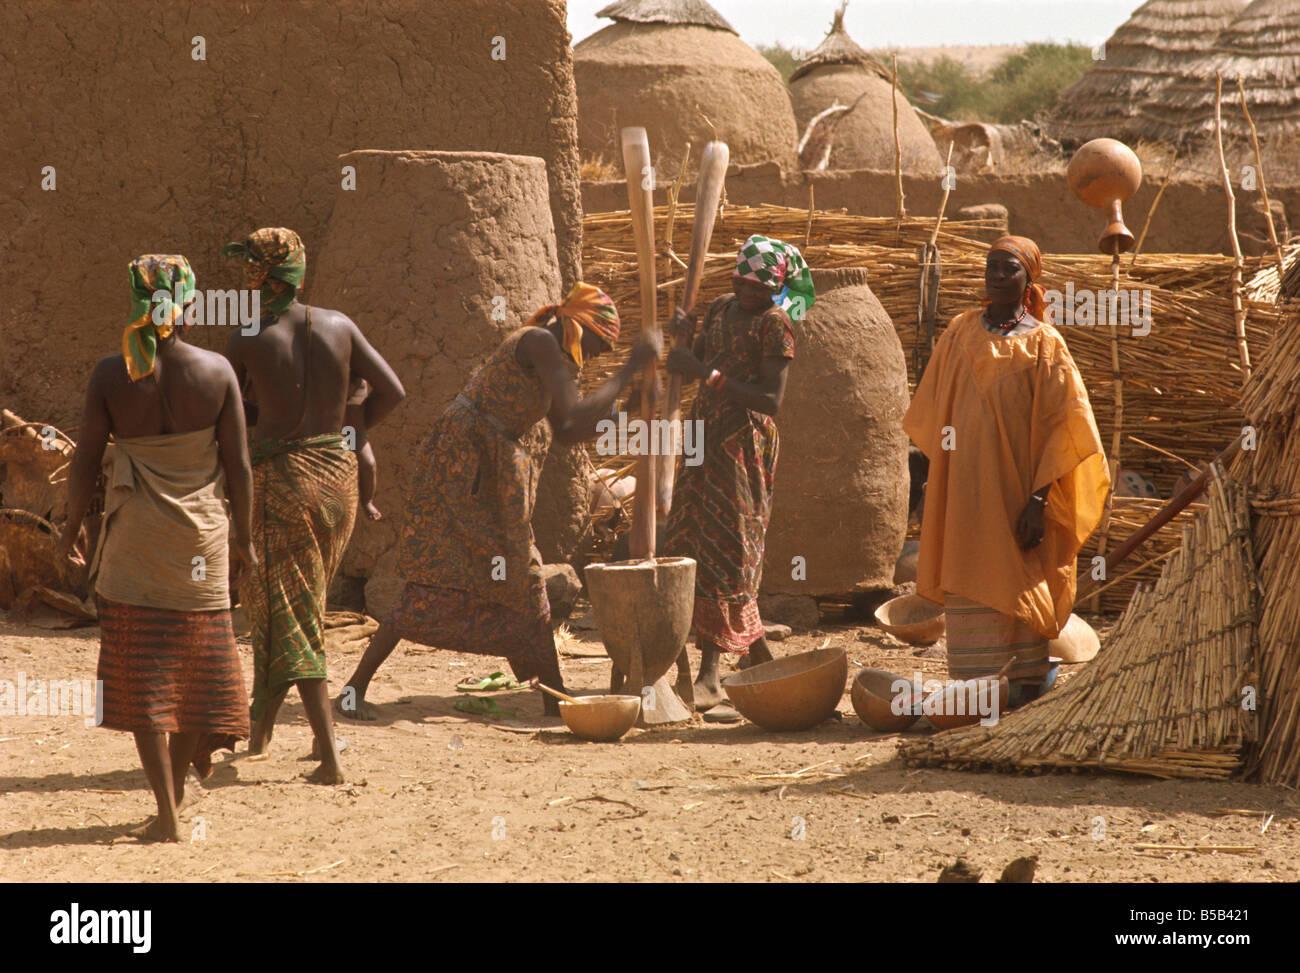 Women pounding millet at Abalak, Niger, West Africa, Africa - Stock Image